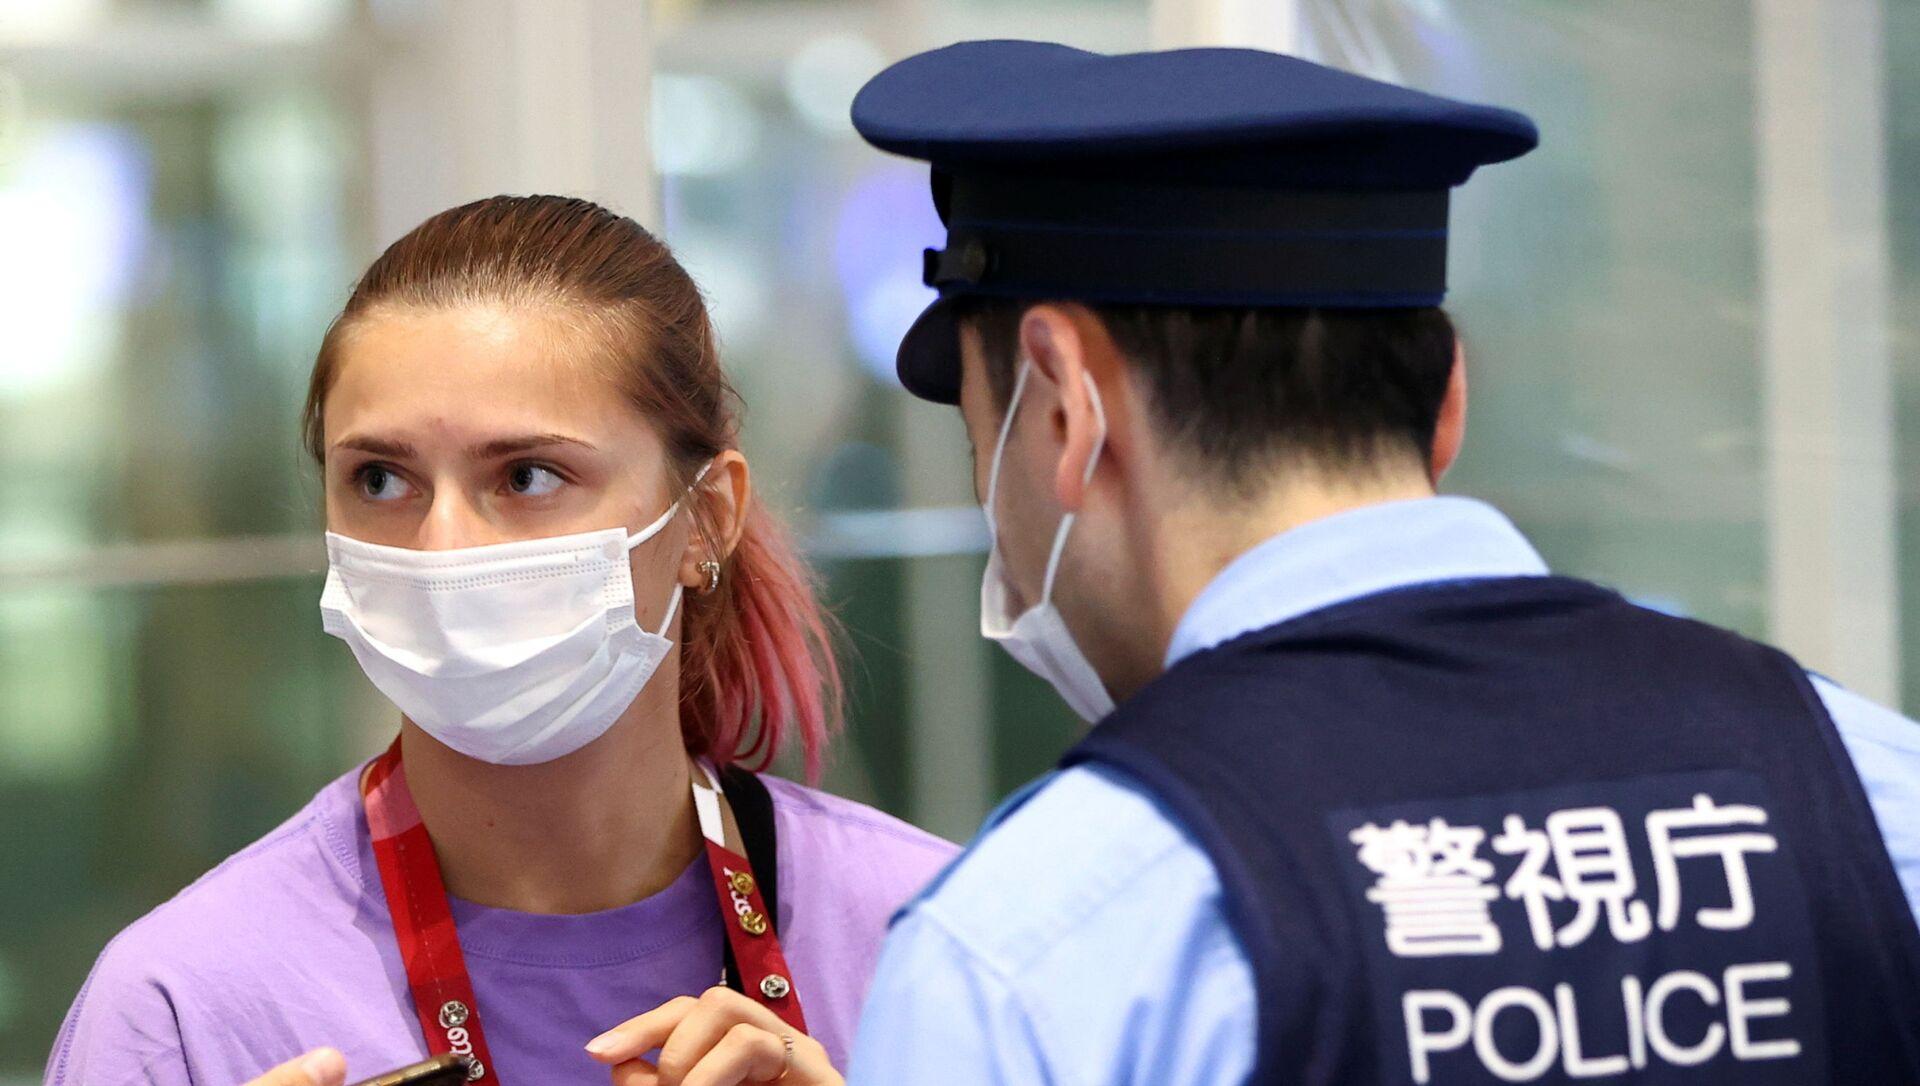 Belarusian sprinter Krystina Tsimanouskaya talks with police officers at Haneda international airport in Tokyo, Japan - Sputnik International, 1920, 02.08.2021